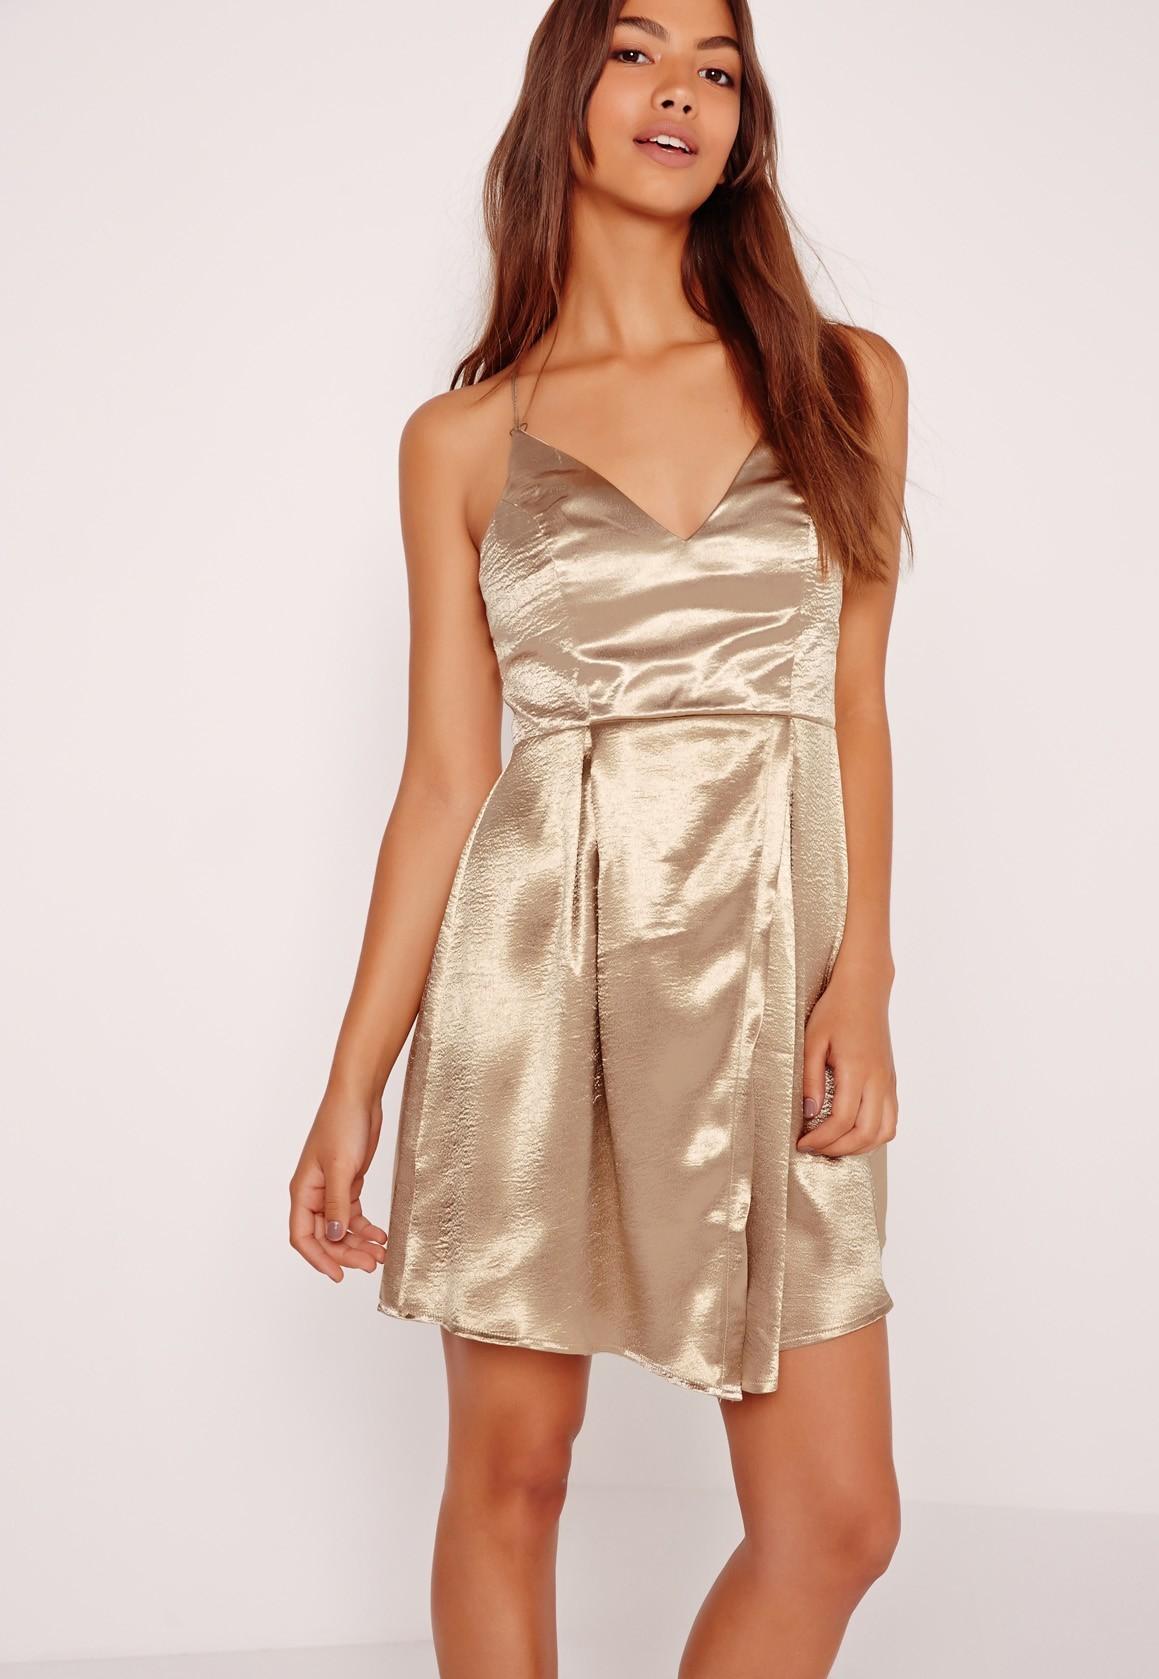 silky gold dress